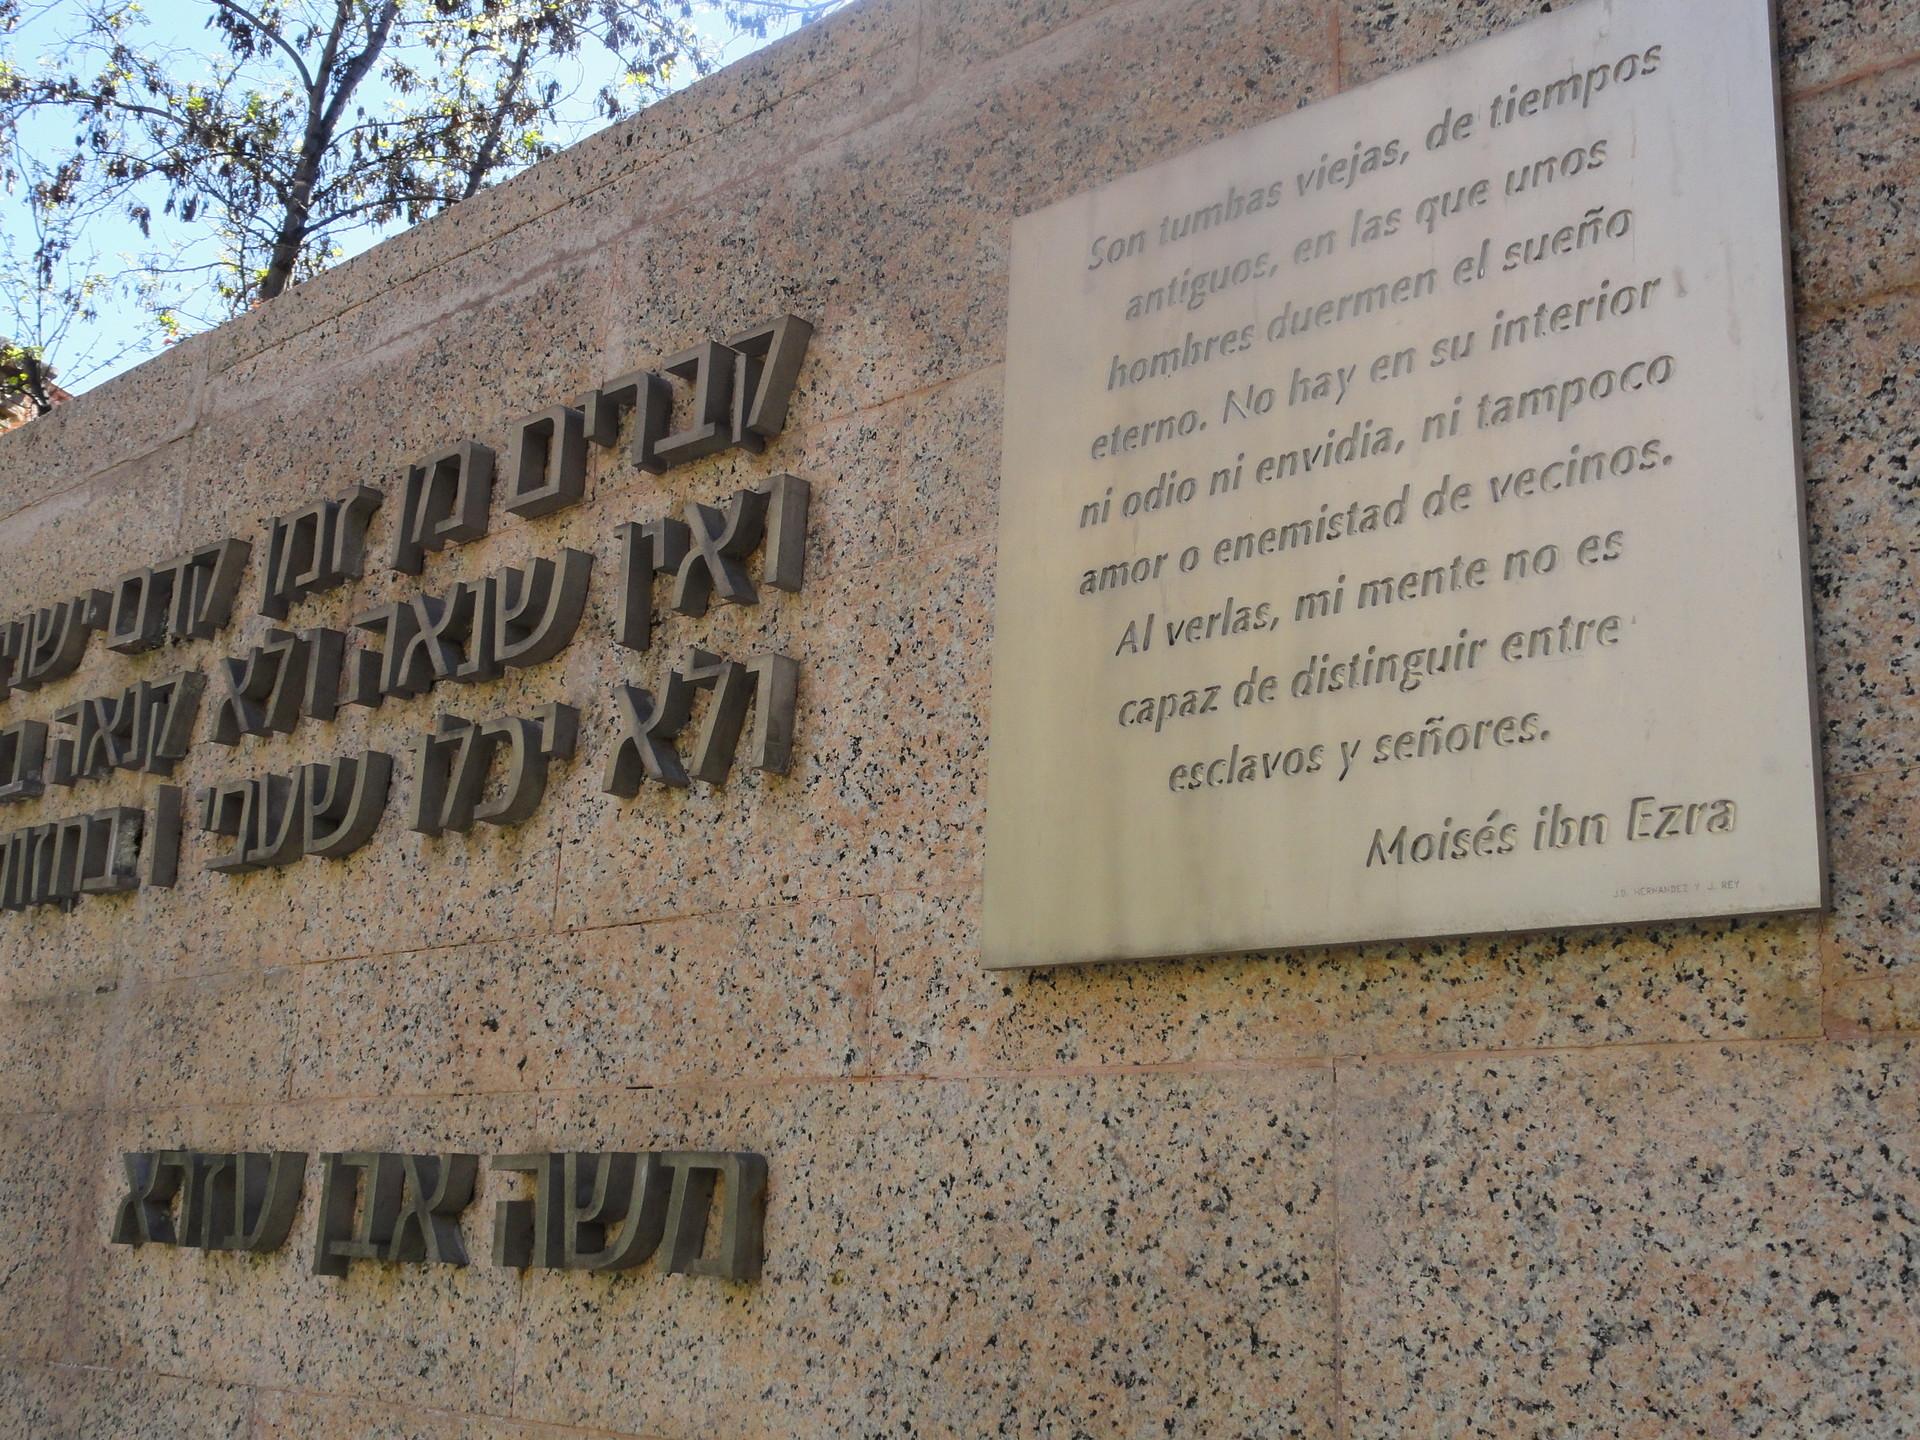 sinagoga-transito-museo-sefardi-61fba978